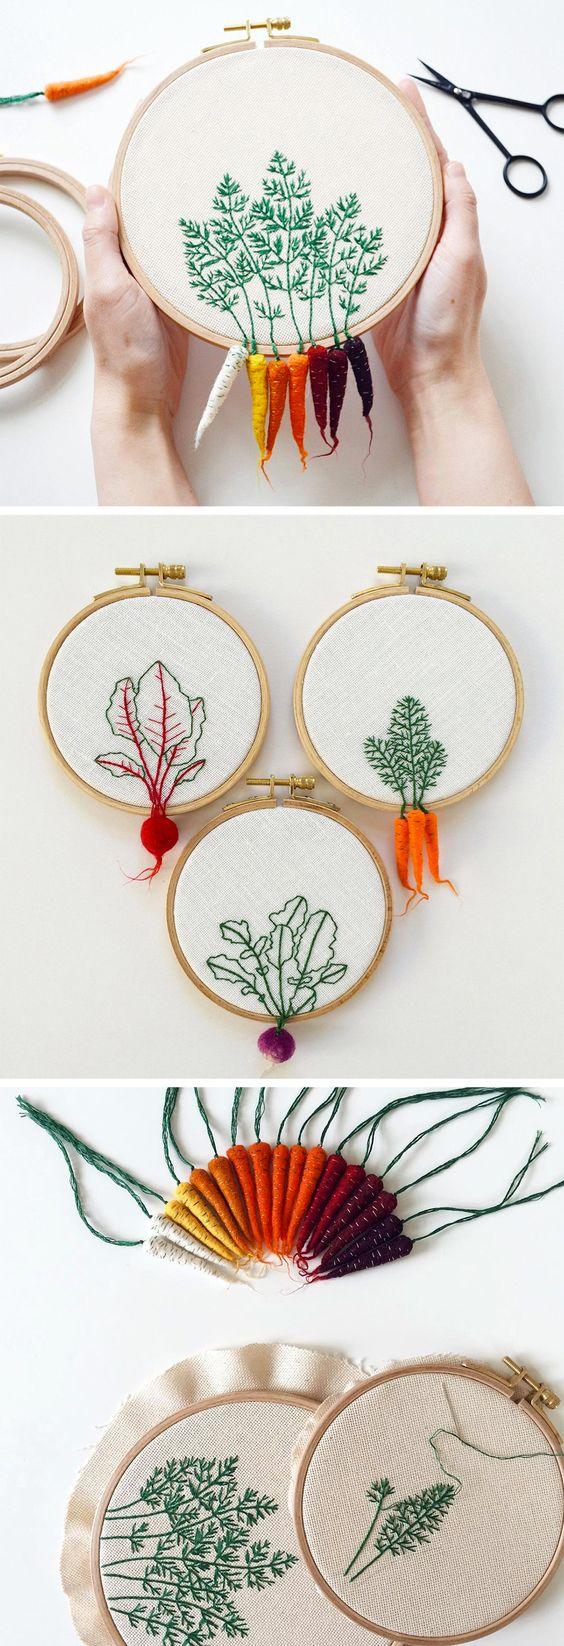 Felted Veggies Cling to Embroidery Hoops by Veselka Bulkan: